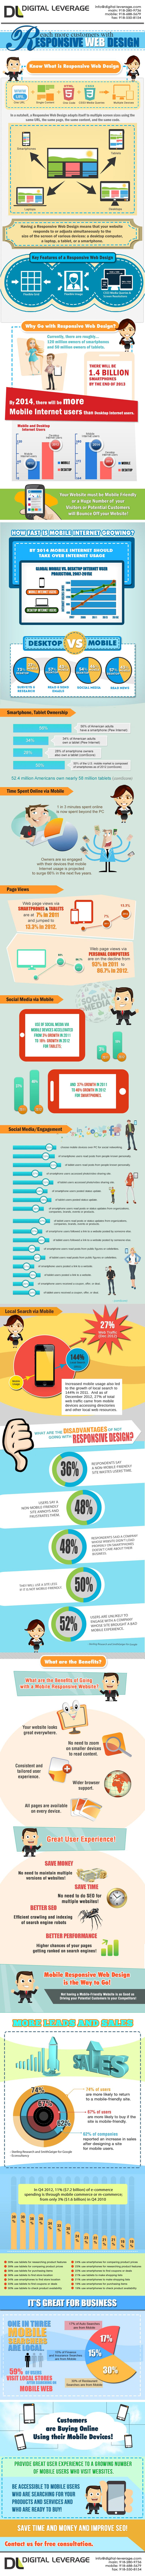 Digital-Leverage.com-Responsive-Web-Design-Infographics-2013